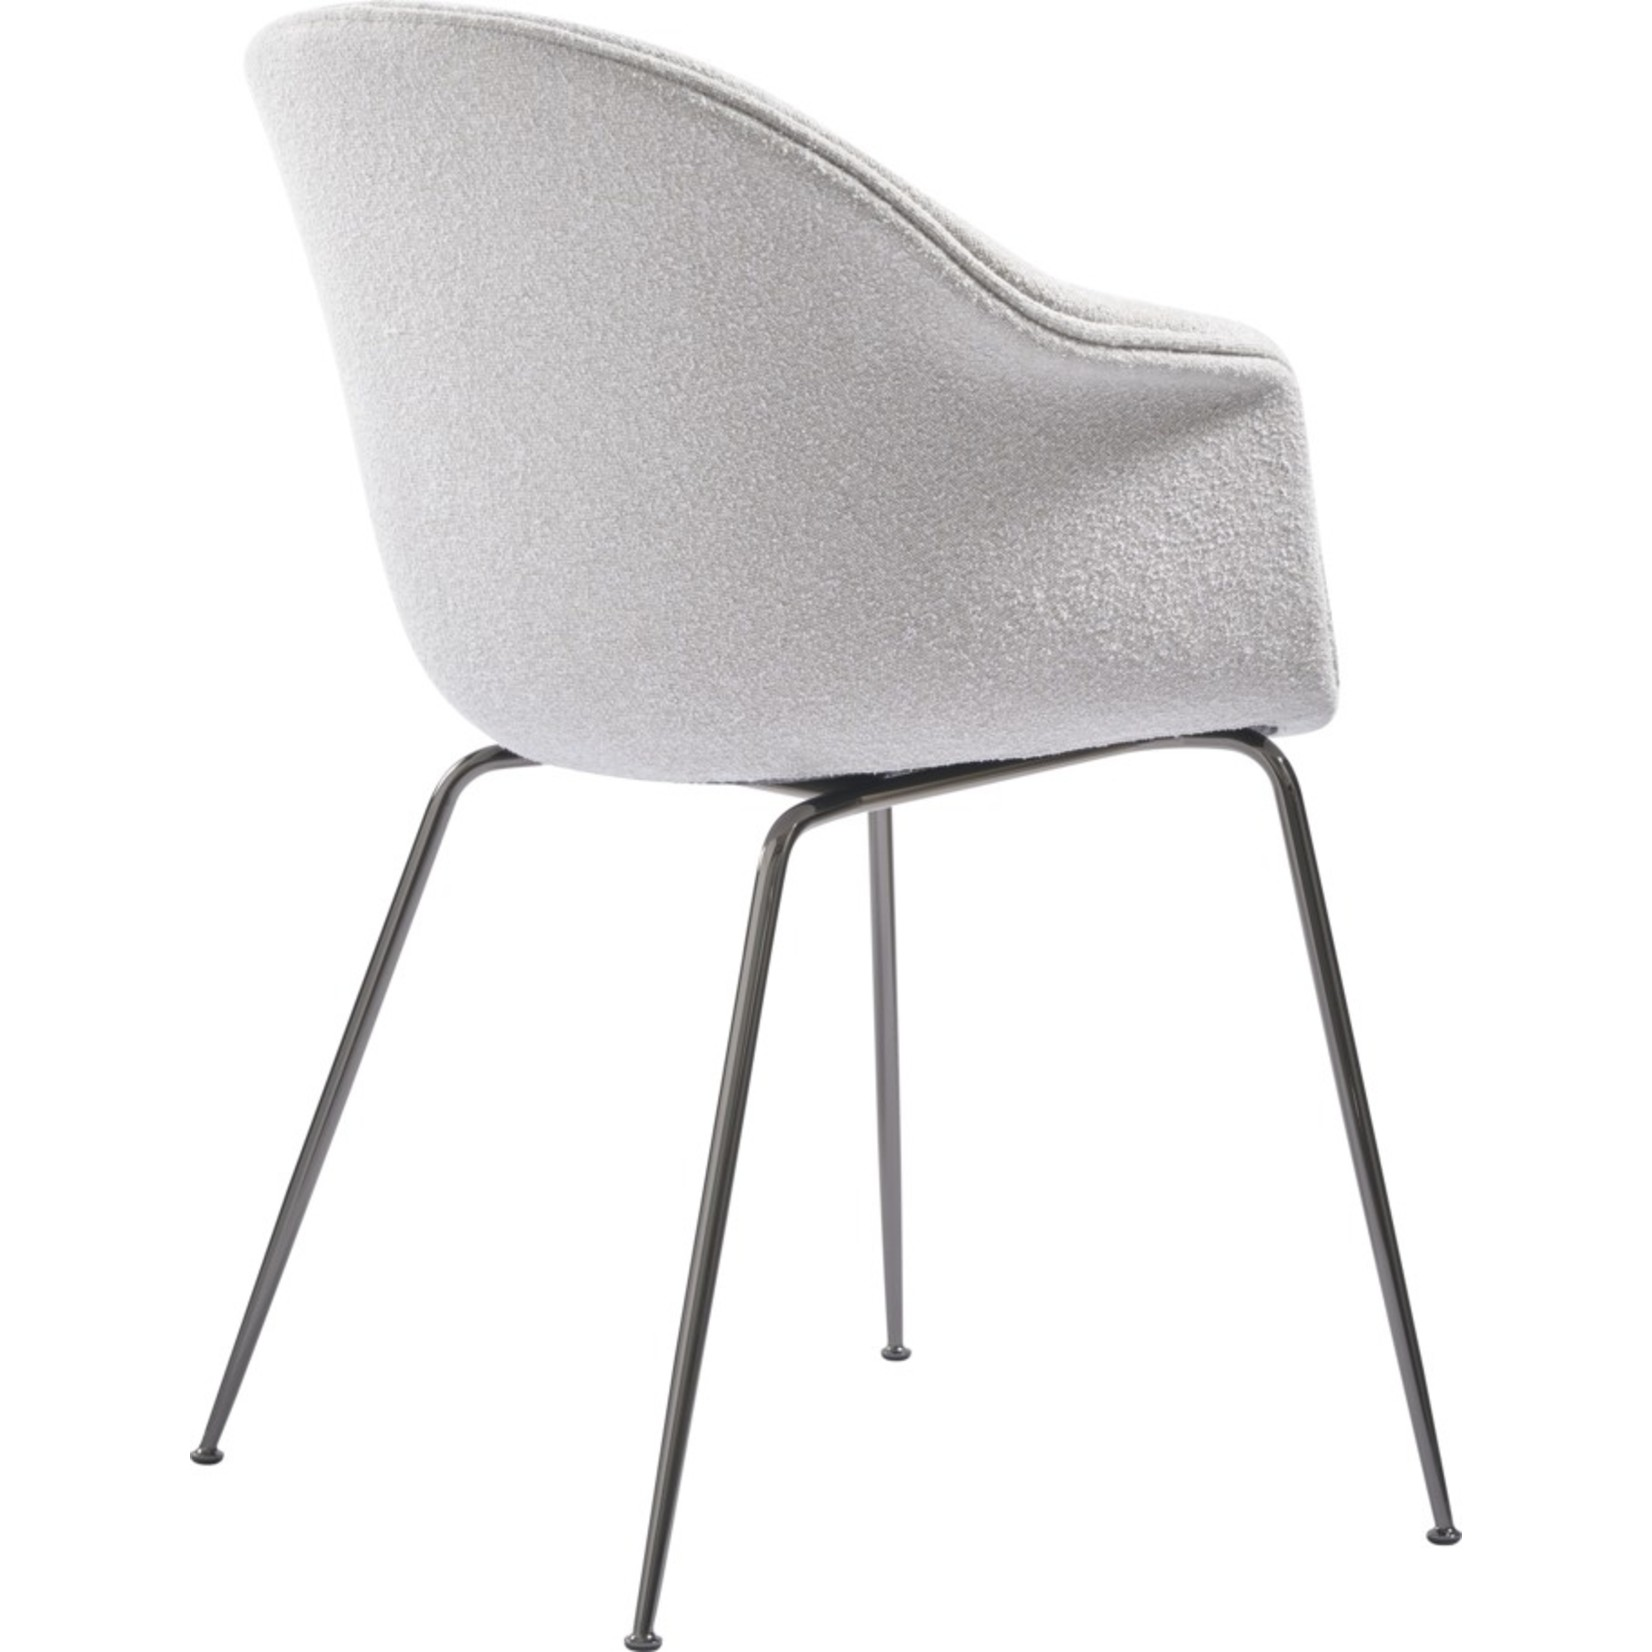 Gubi Bat Dining Chair | Light Bouclé 001 & Black Chrome Base